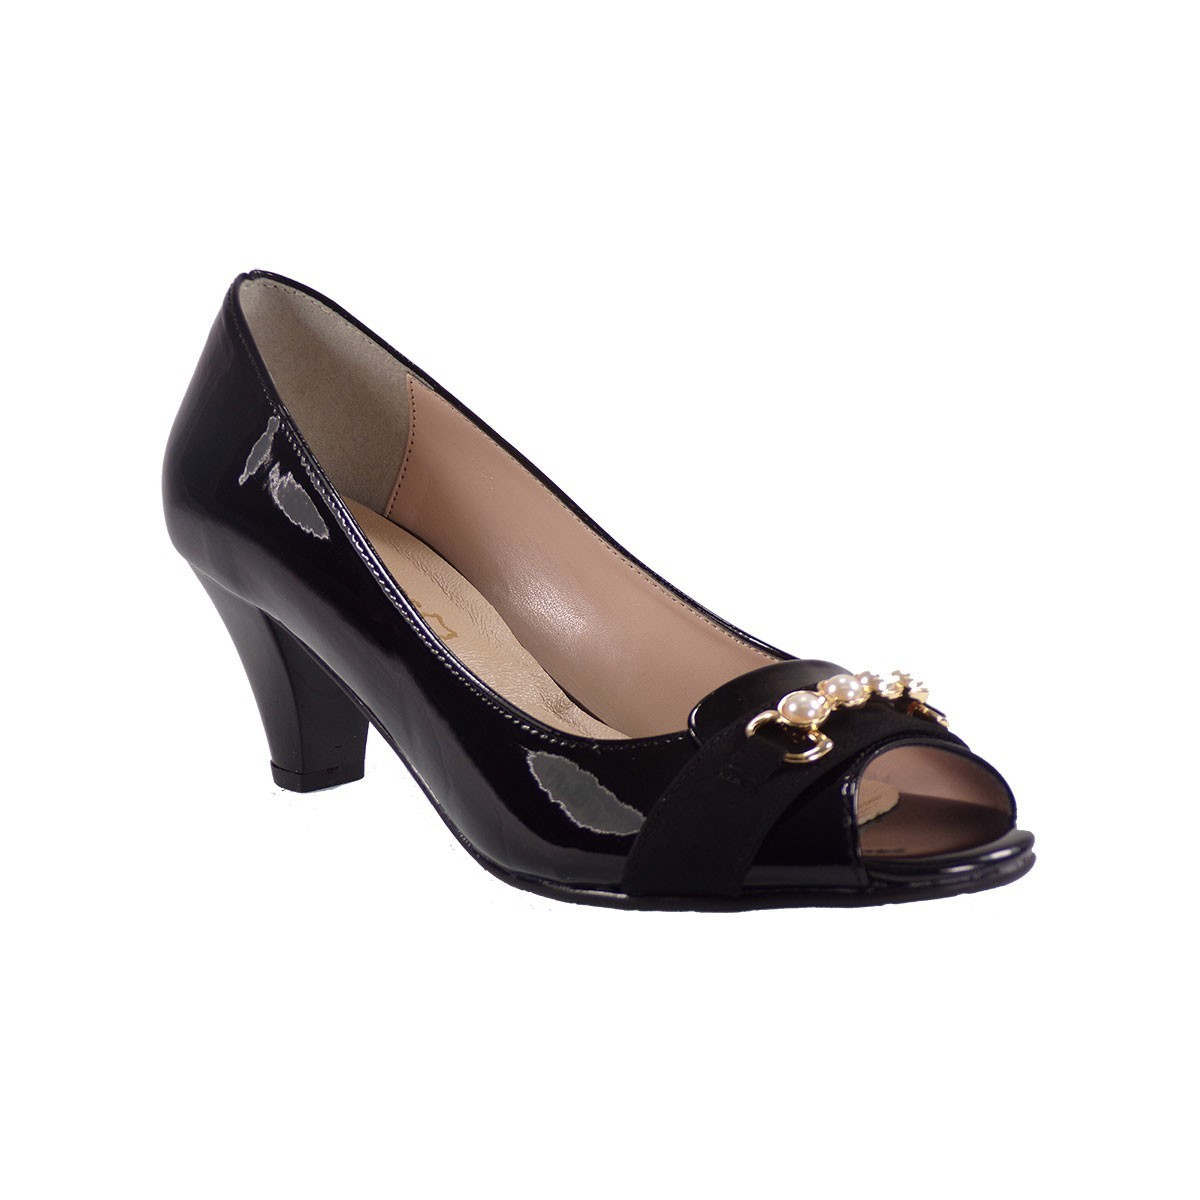 Katia Shoes Γυναικεία Παπούτσια Γόβες 89-872 Μαύρο